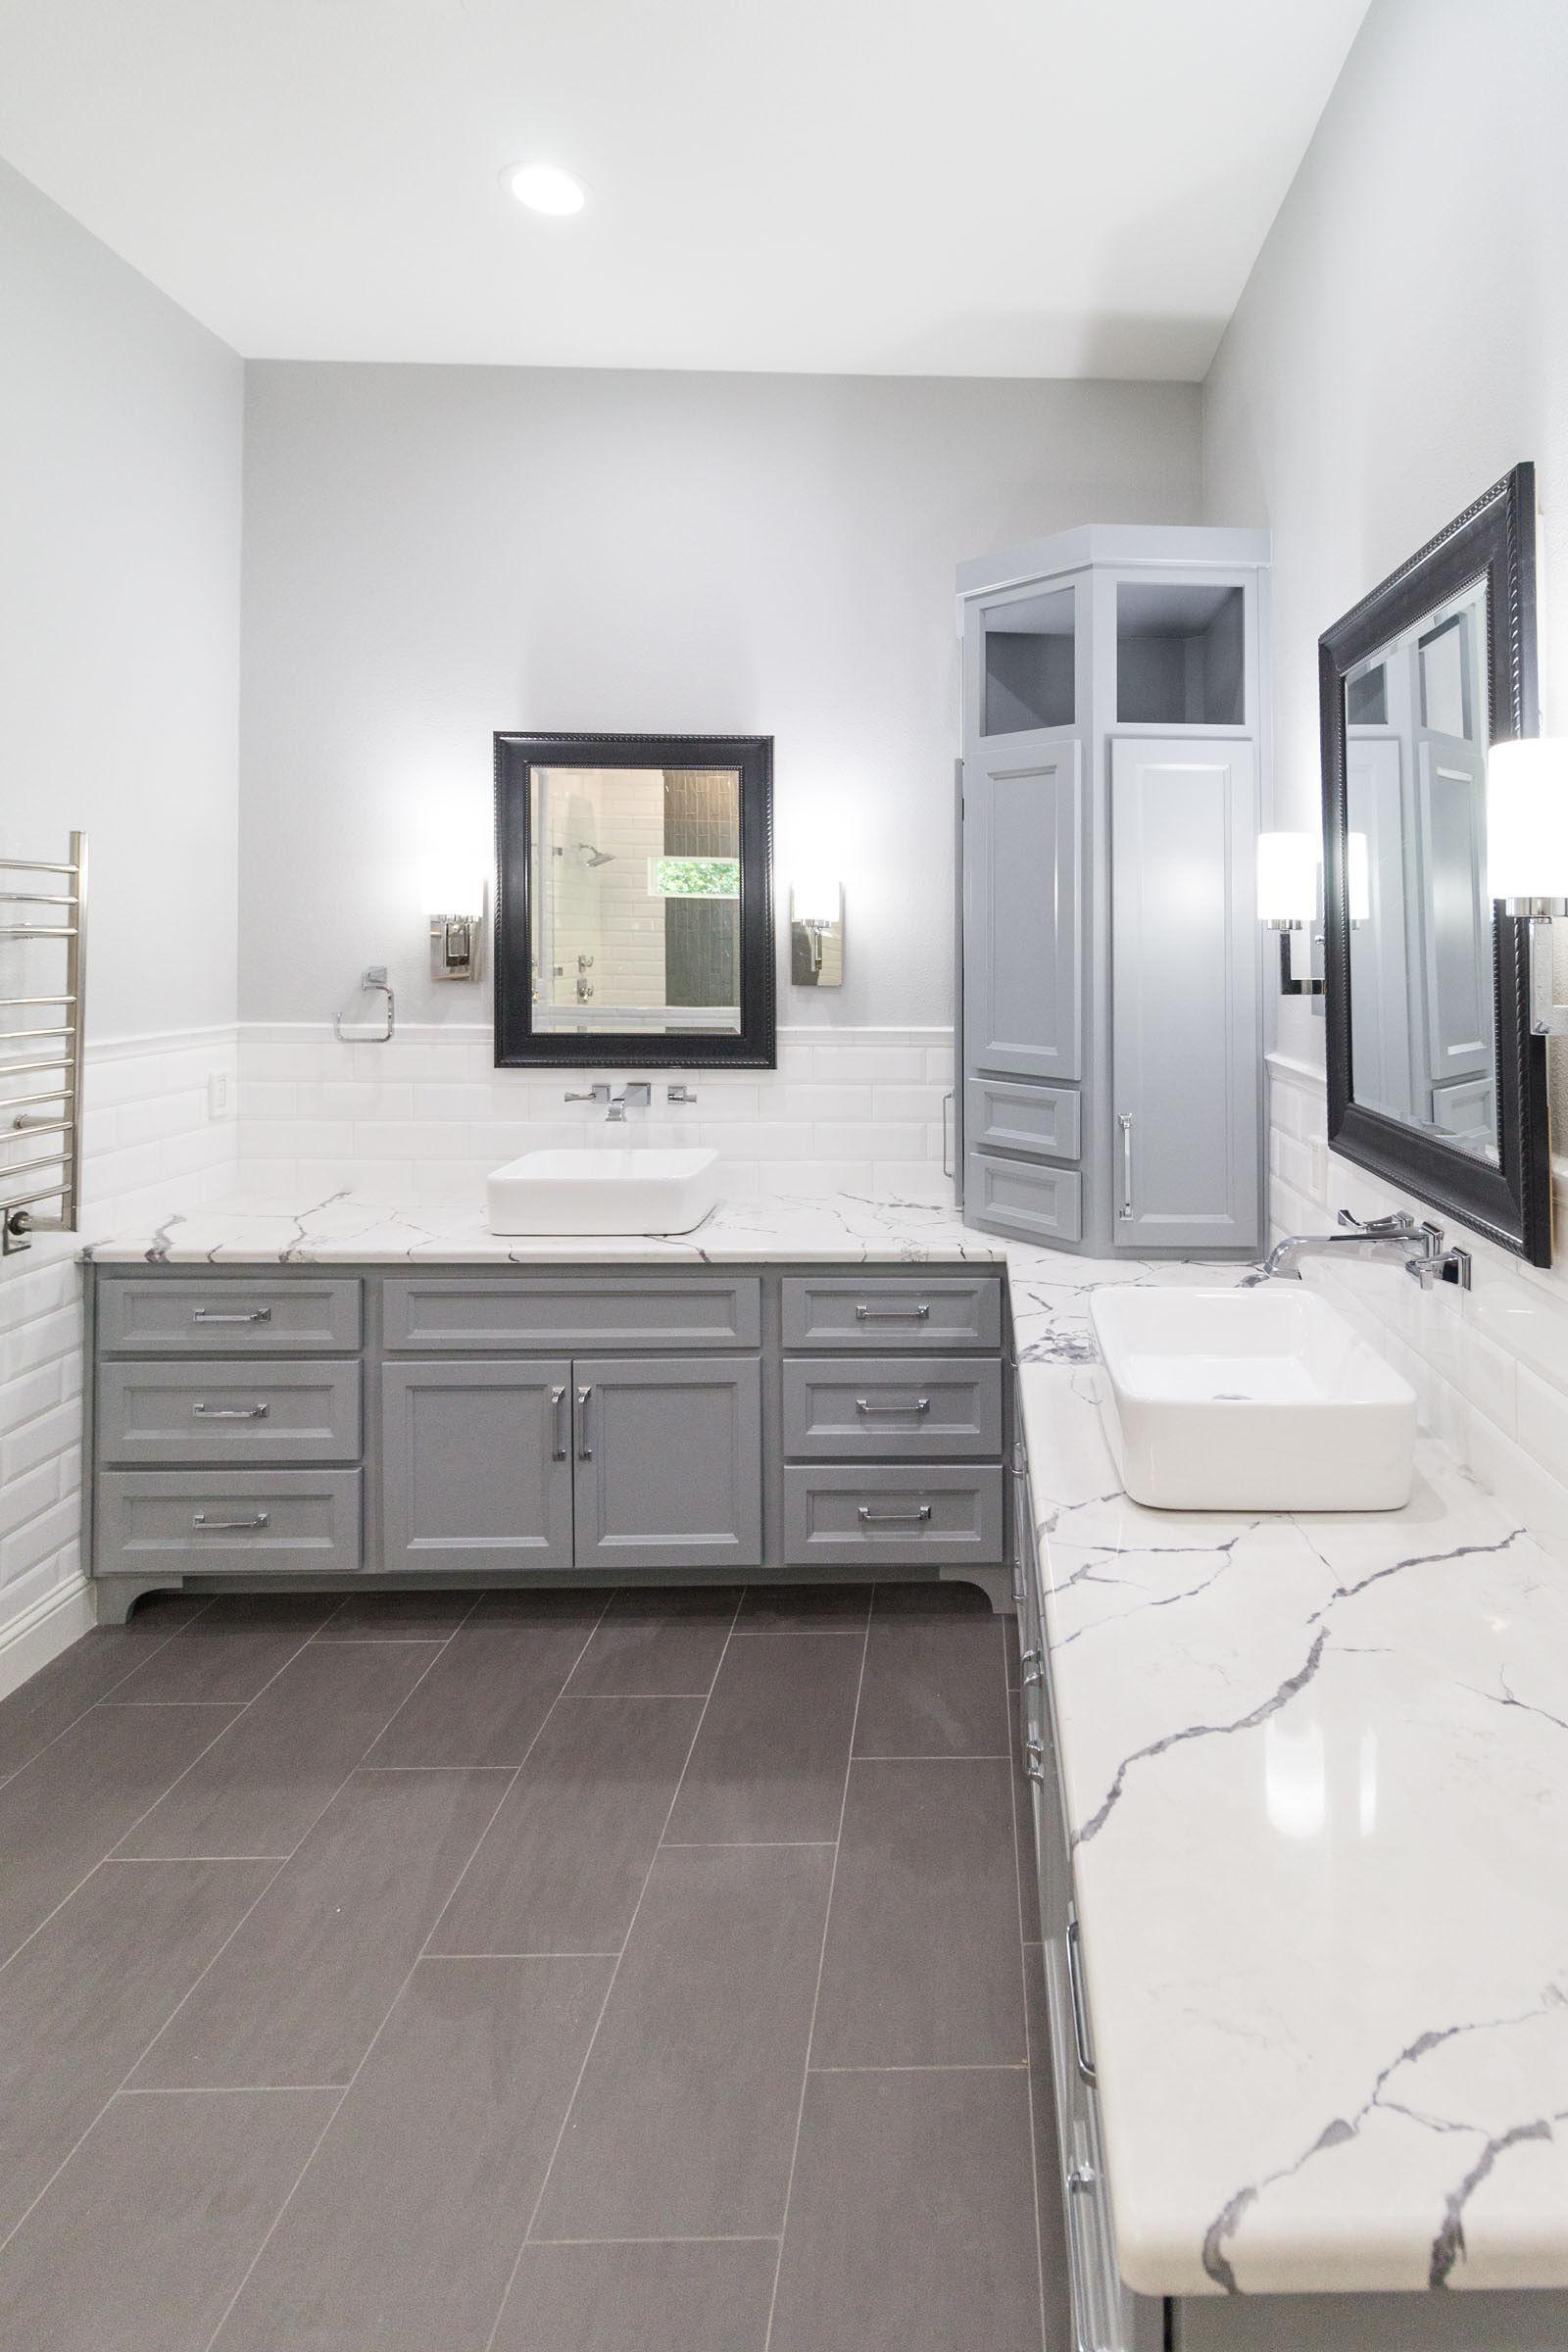 Contemporary bathroom remodel white granite, grey cabinets, clean and bright